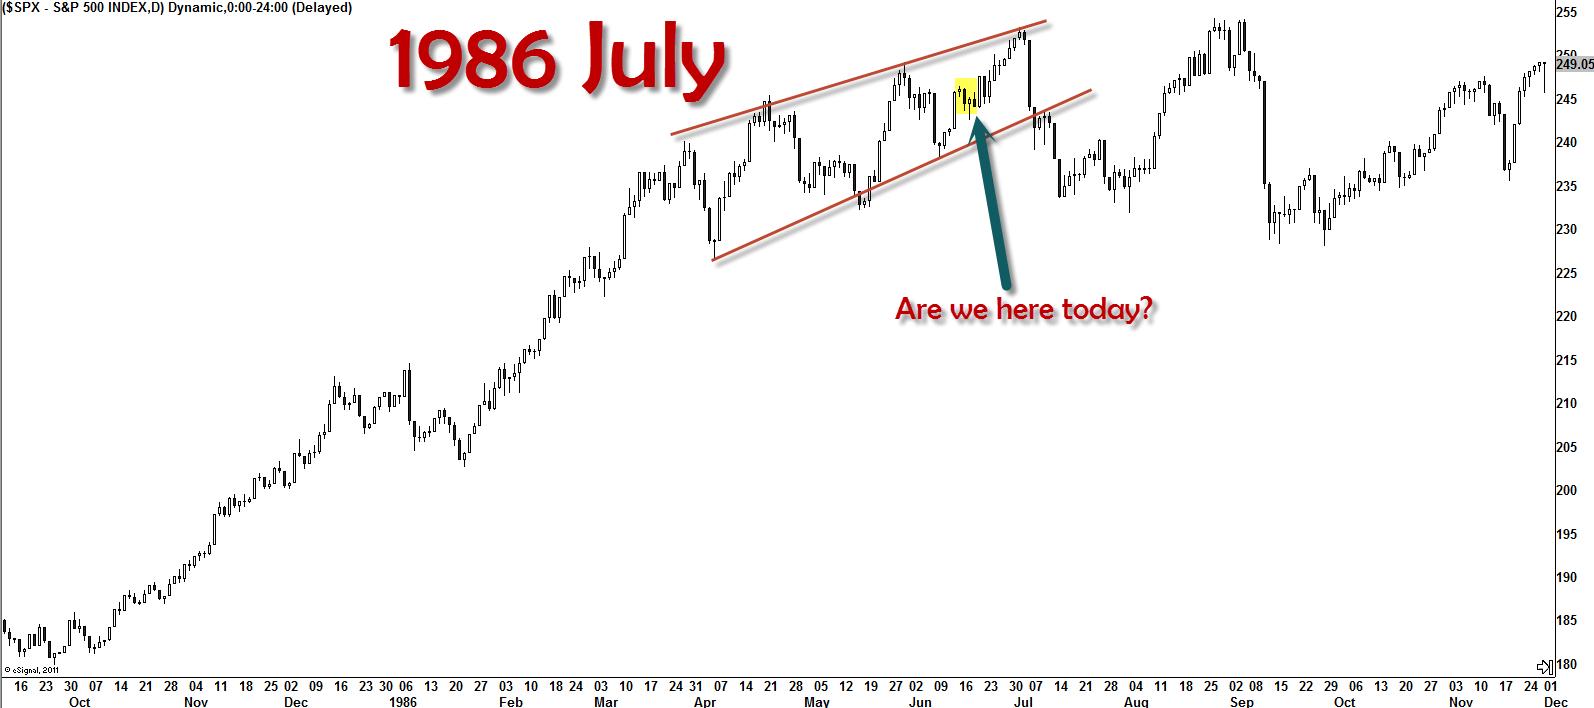 SPECIAL REPORT: $SPX 1986 Chart Suggests Bullish Run Until